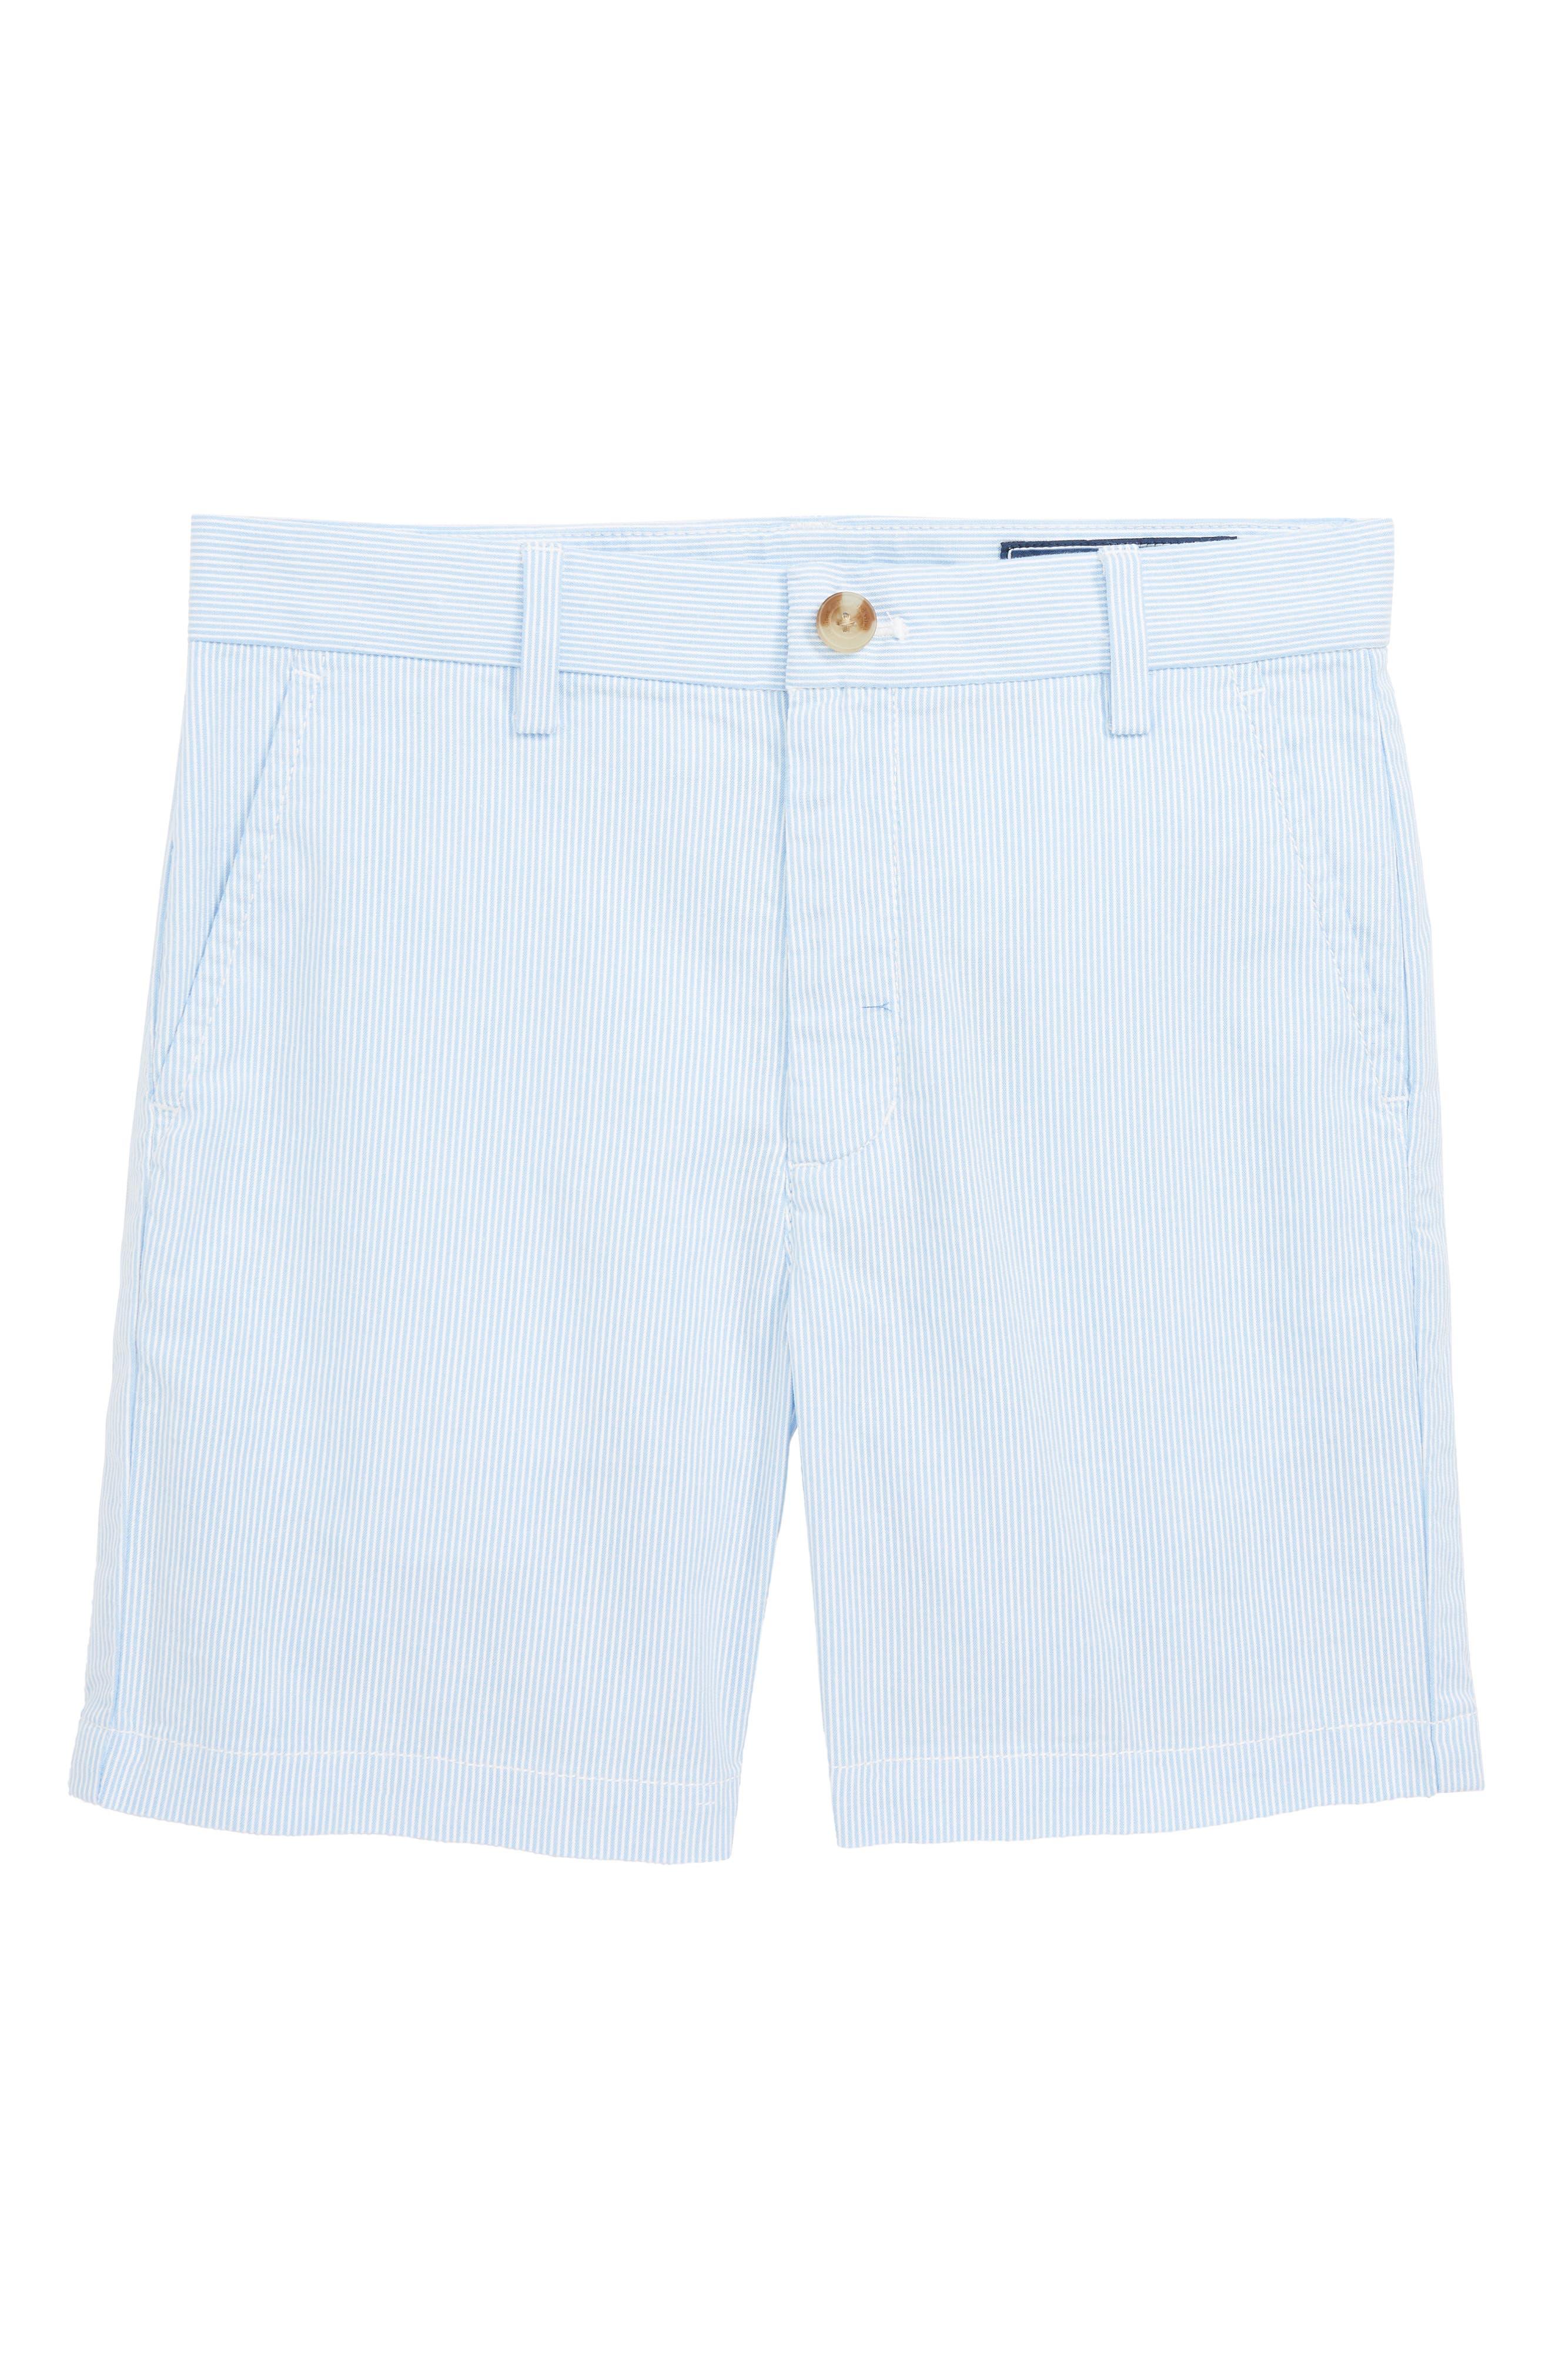 Pincord Stripe Breaker Shorts,                             Main thumbnail 1, color,                             Ocean Breeze